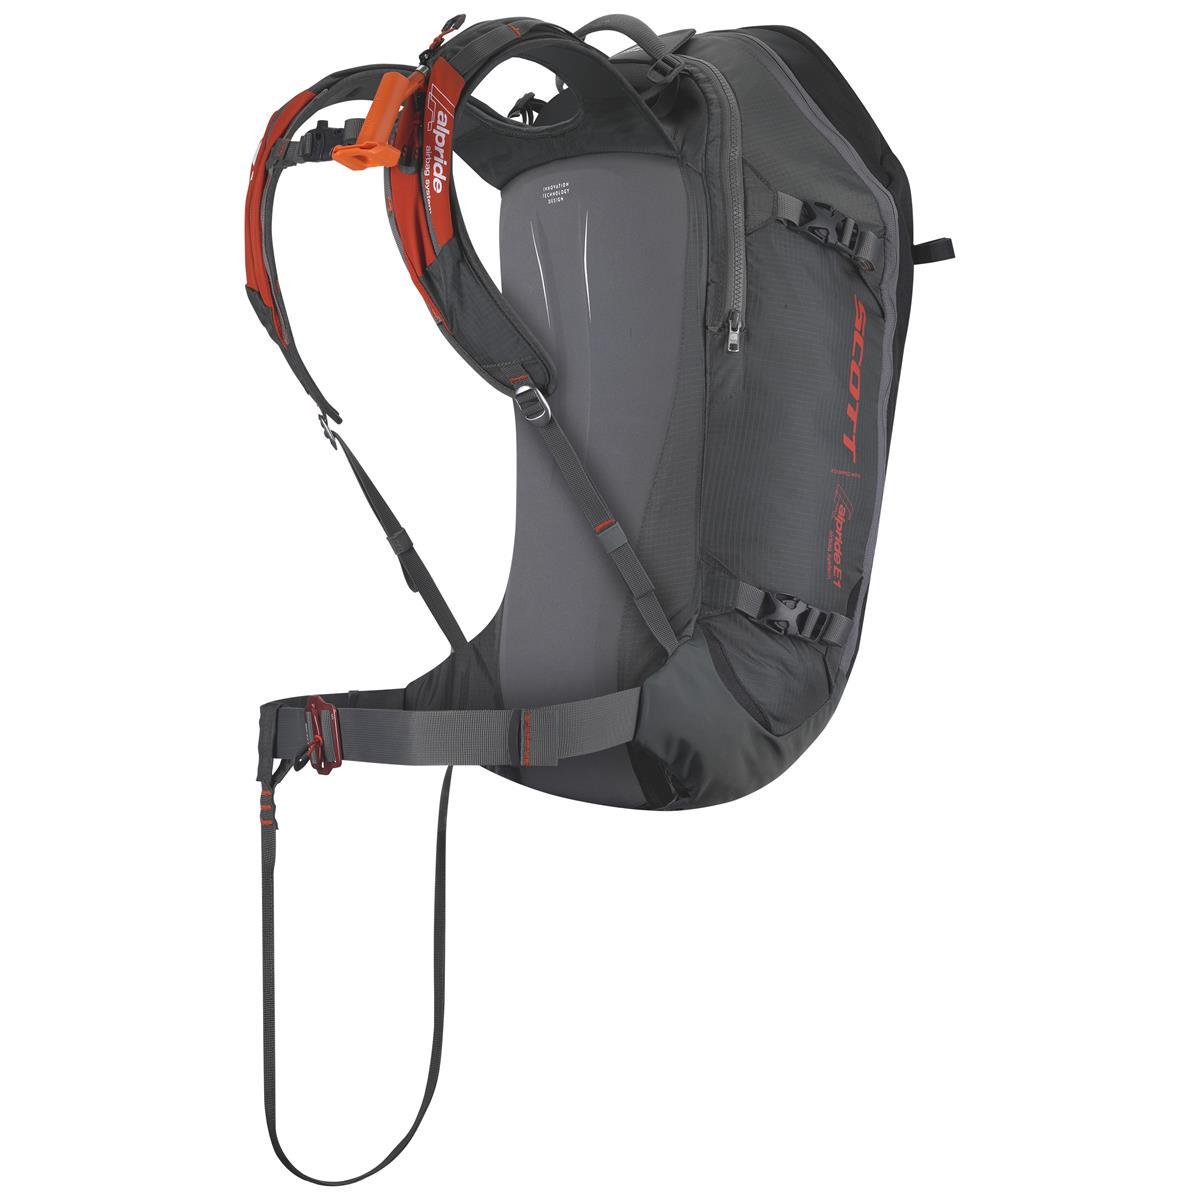 scott-patrol-alpride-e1-30l-avalanche-kit-backpack_ black_back.jpg